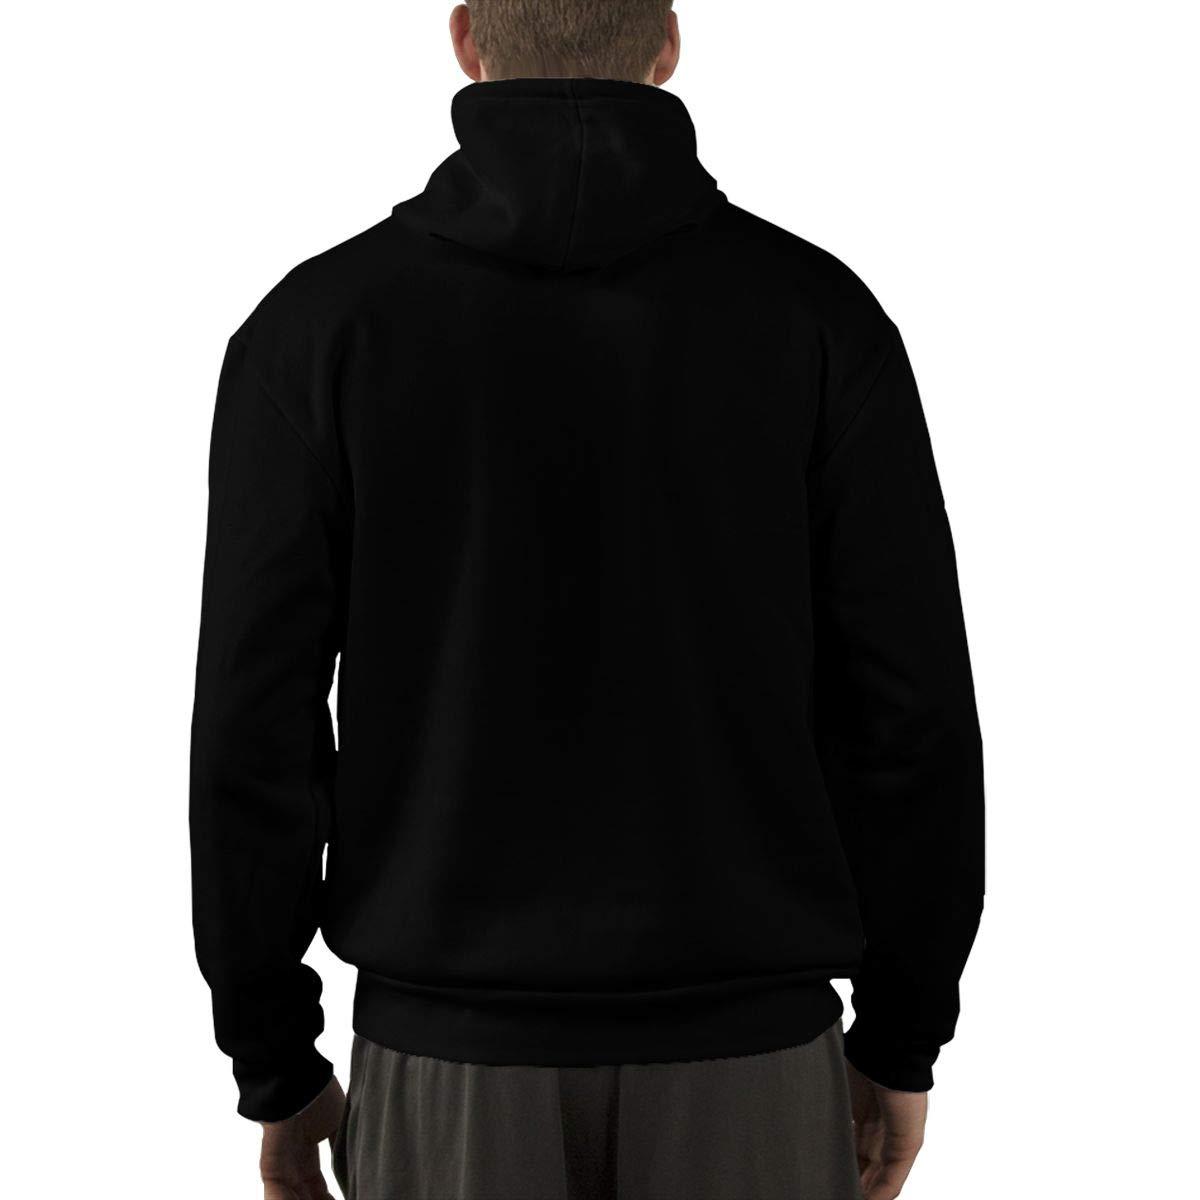 Pldmkg Pitbull Mom Logo Hoodie Full Zip Hoodie with Drawstring Hood